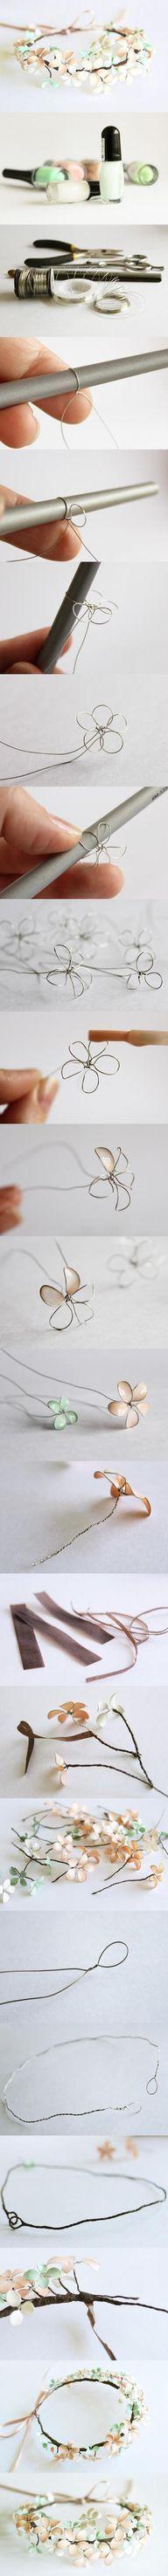 Flowers - http://craftideas.bitchinrants.com/flowers/